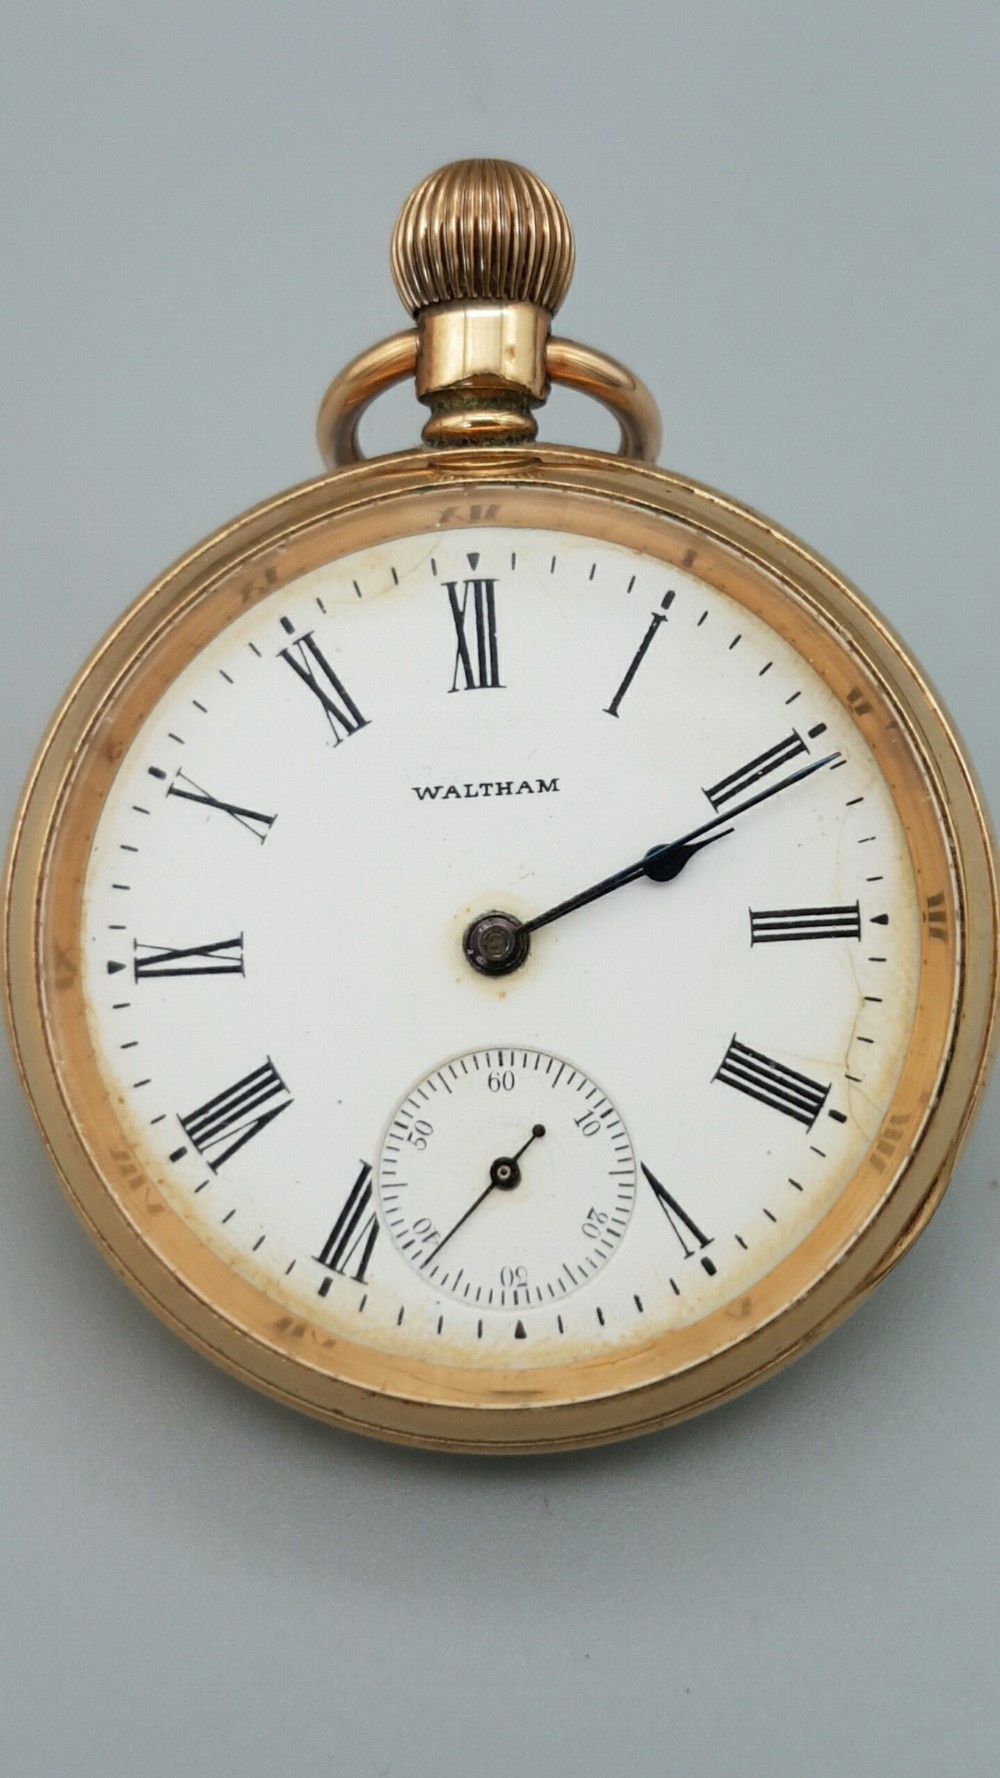 antique open faced waltham traveler open face pocket watch 14k goldplated case